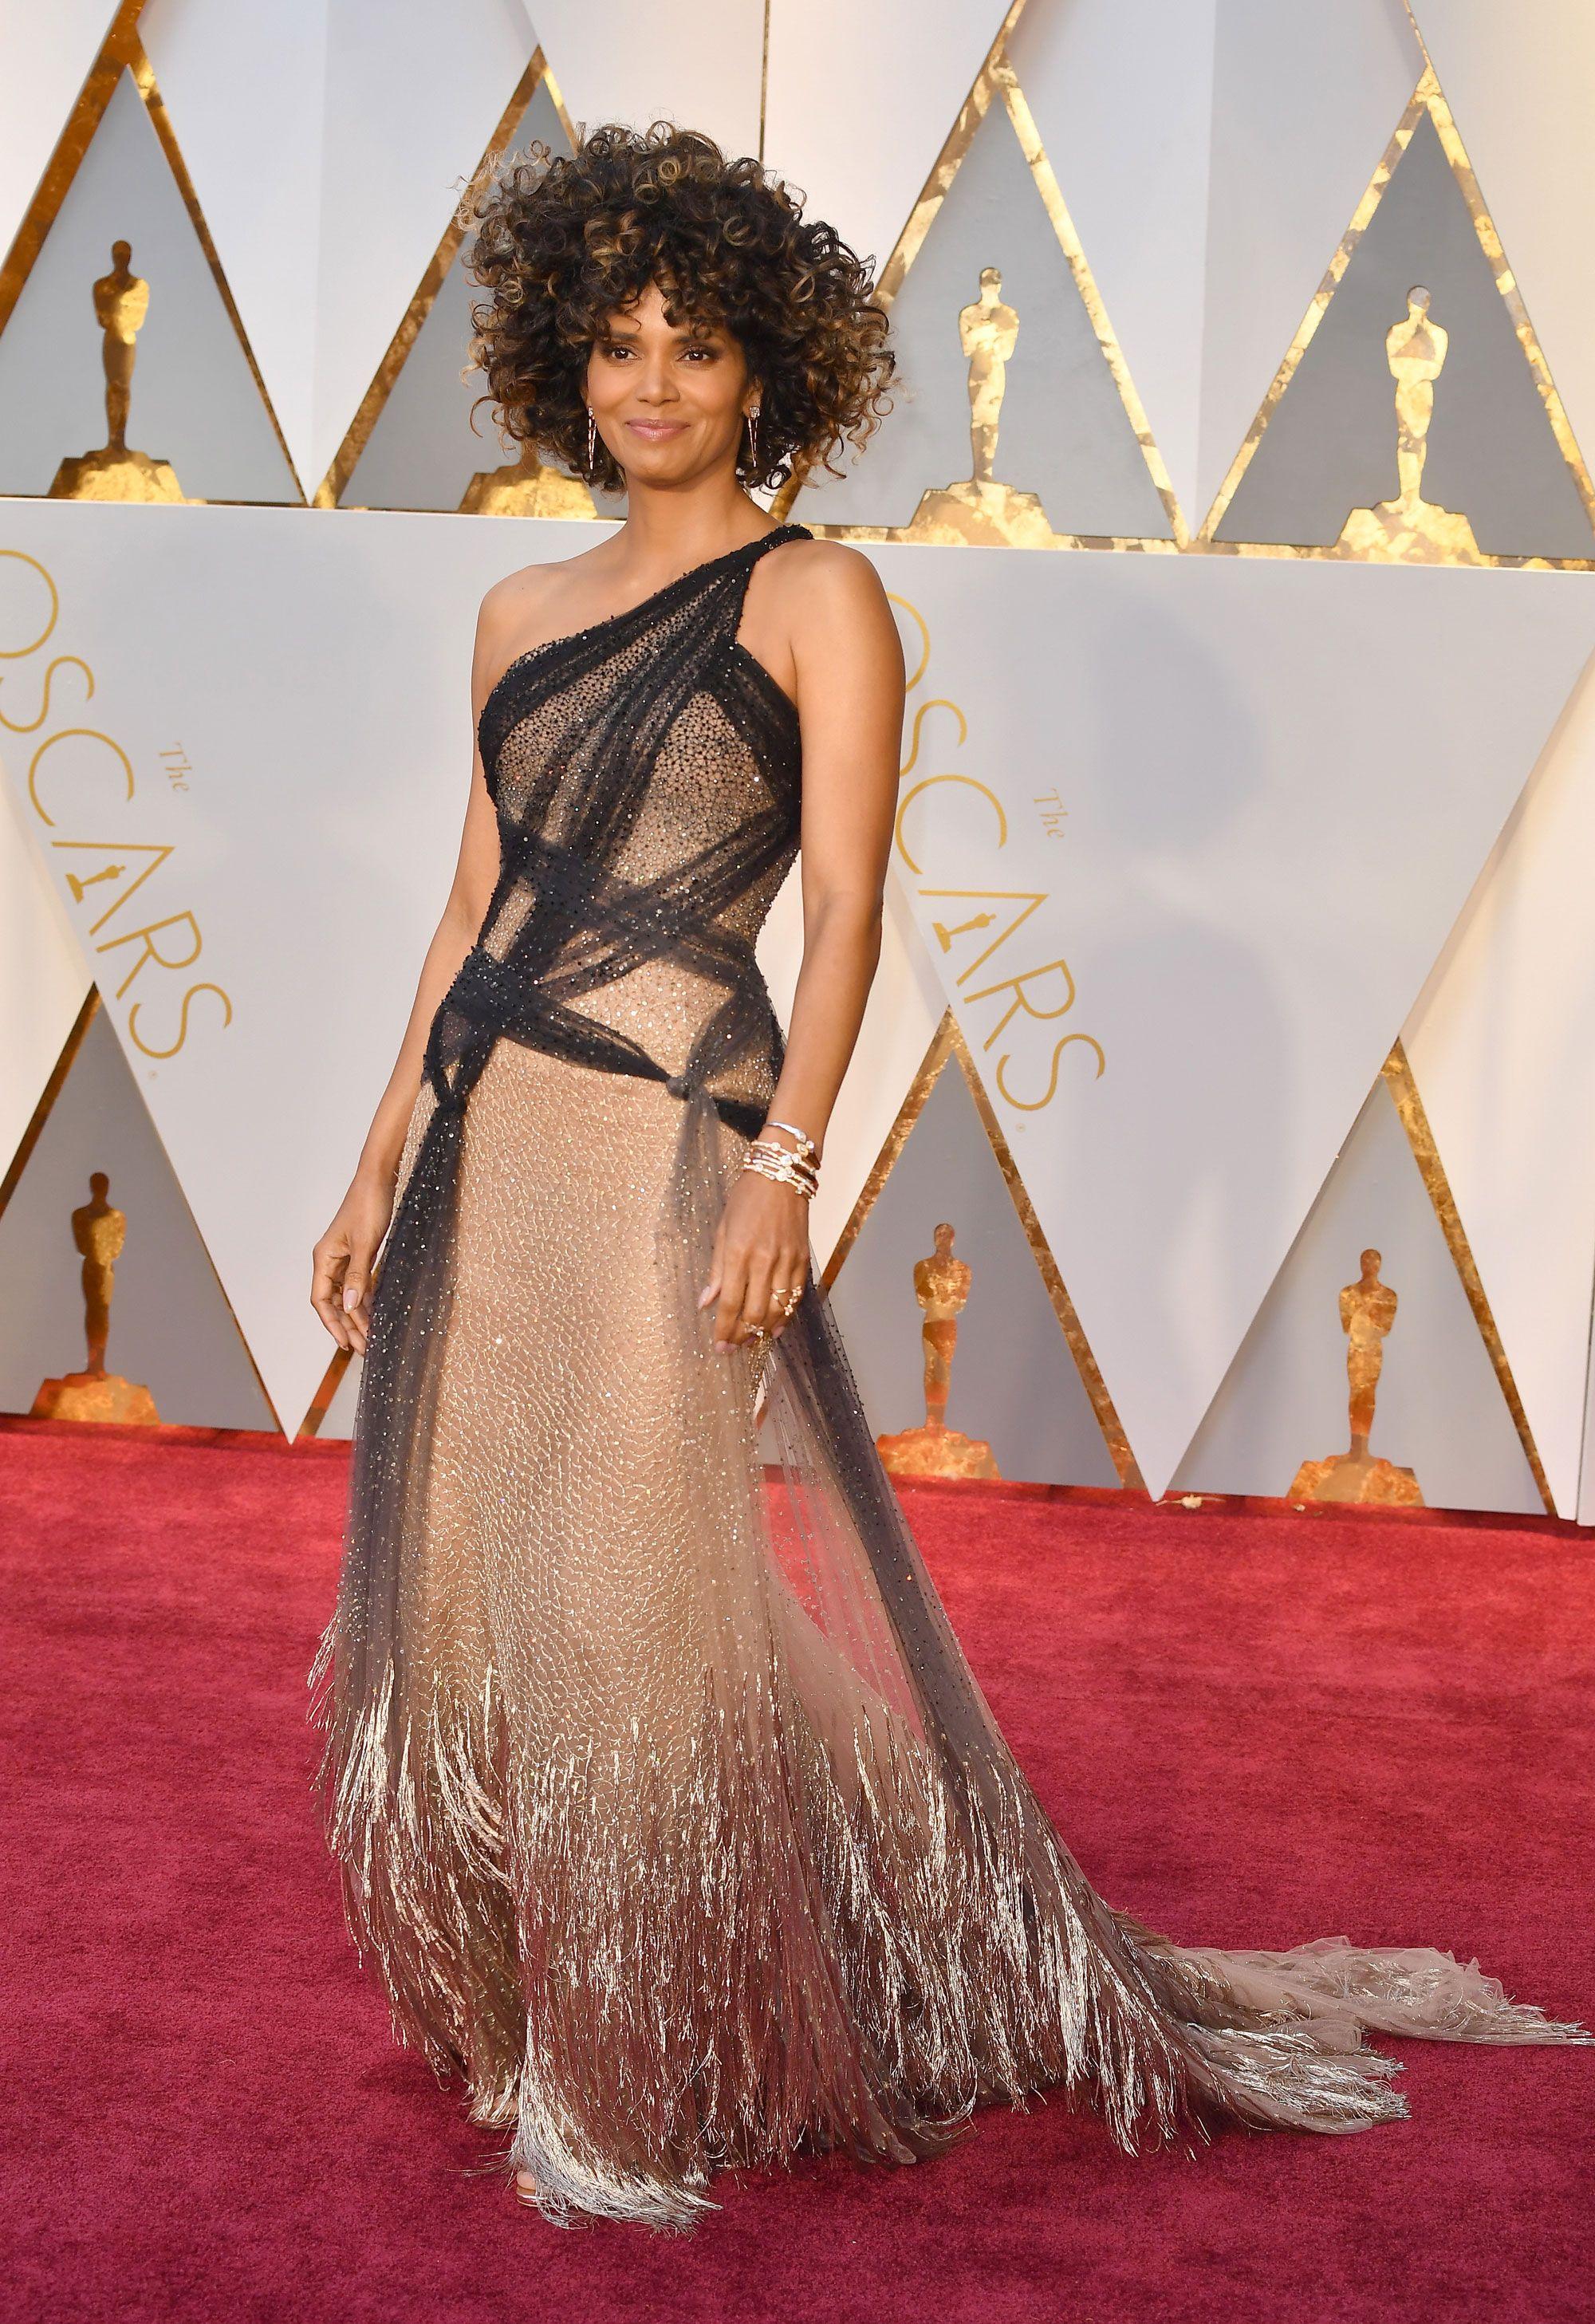 Halley Berry Dress on Oscar